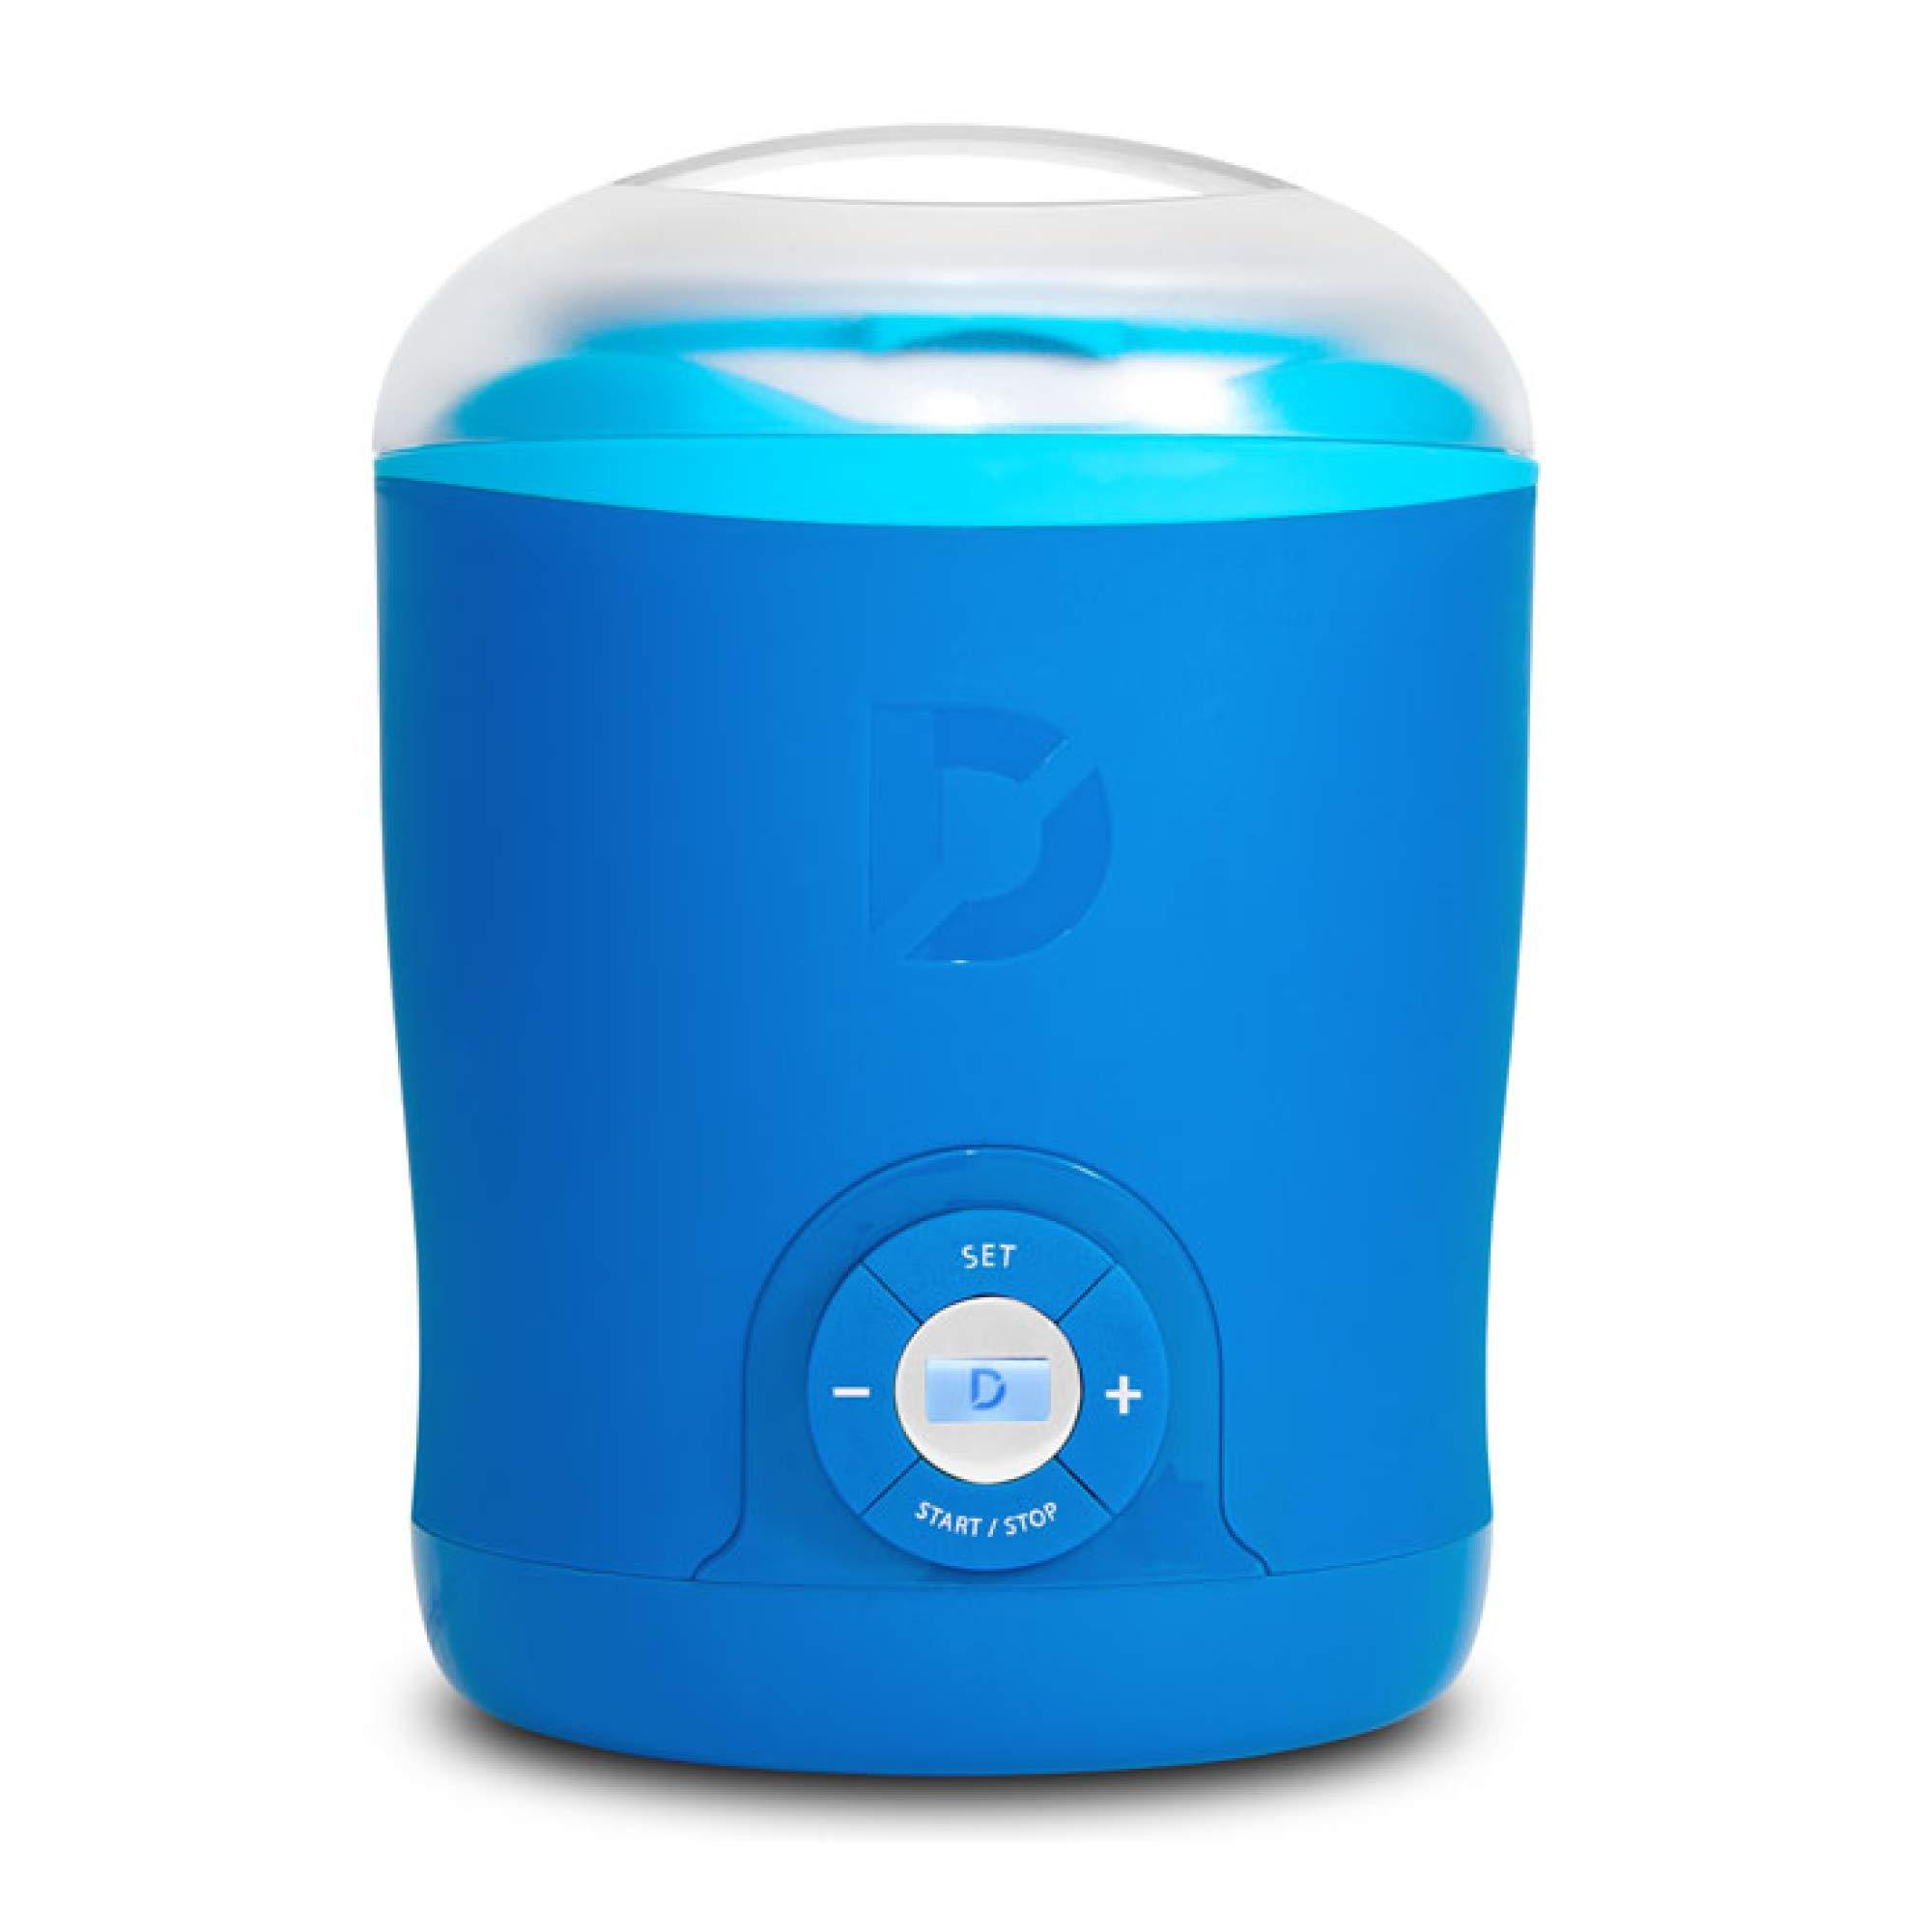 Dash Greek Yogurt Maker Machine with LCD Display + 2 BPA-Free Storage Containers with Lids, Blue (Renewed) by DASH